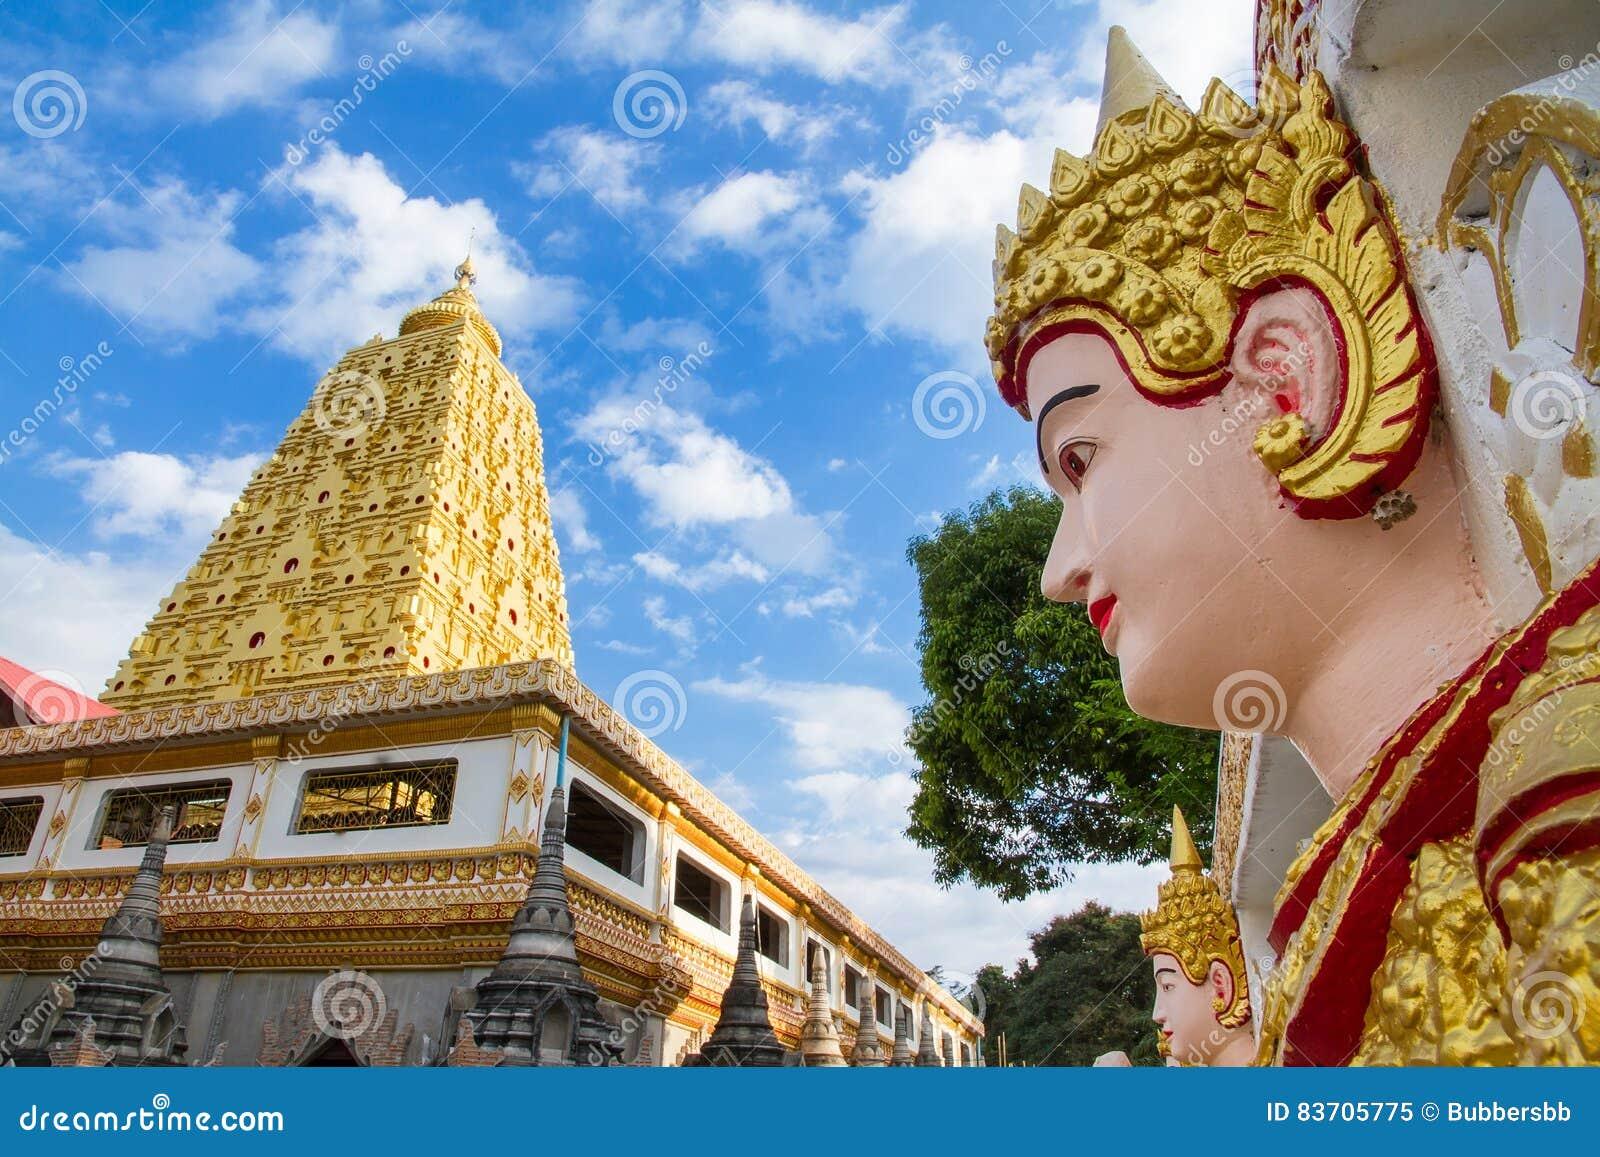 Bodhgaya Stupa Or Phuthakaya Pagoda At Sangklaburi, Kanchanaburi Stock Photo